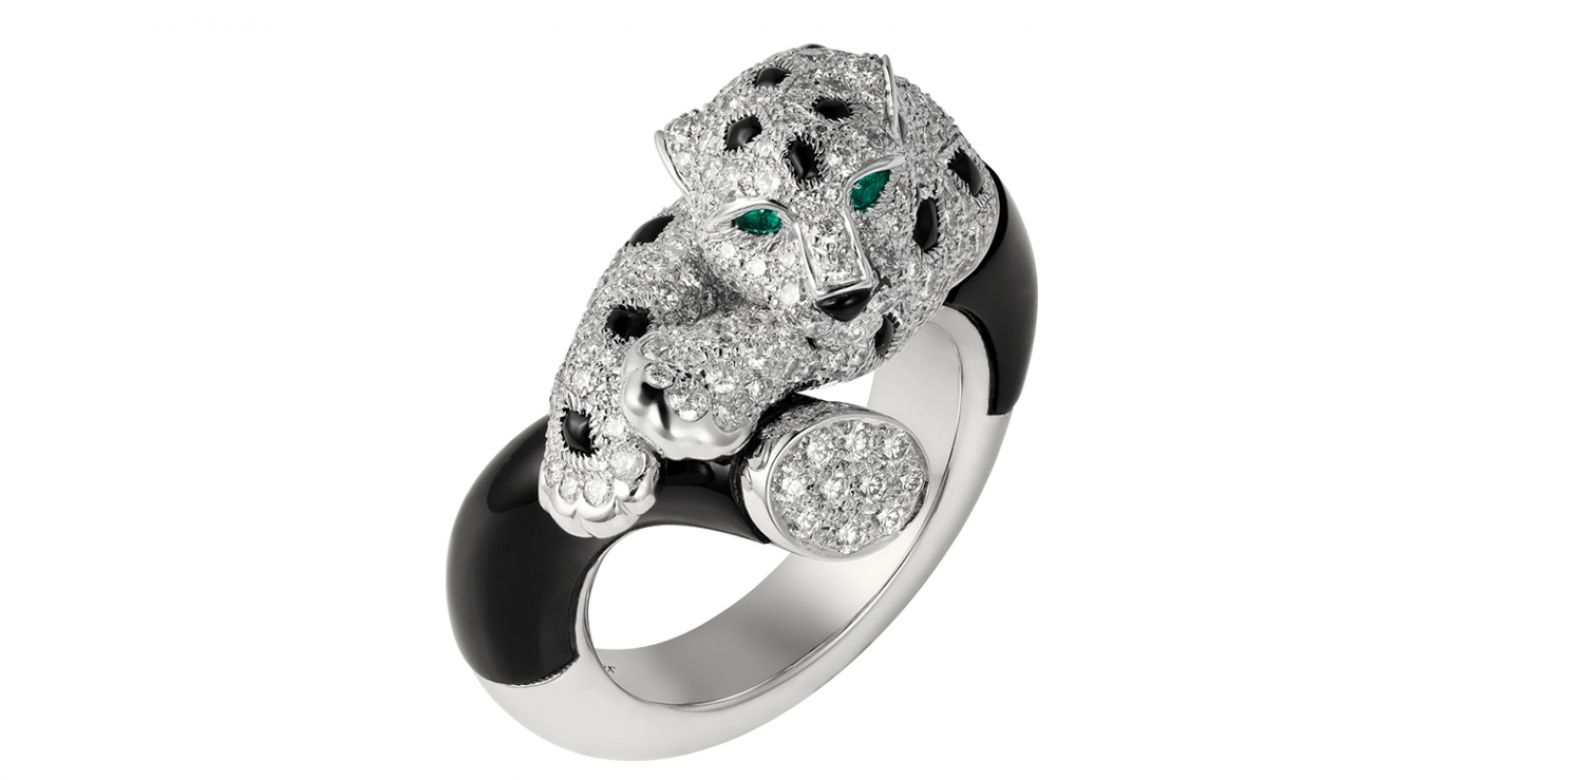 Panthère de Cartier 美洲豹系列縞瑪瑙戒指。(圖片提供/Cartier)